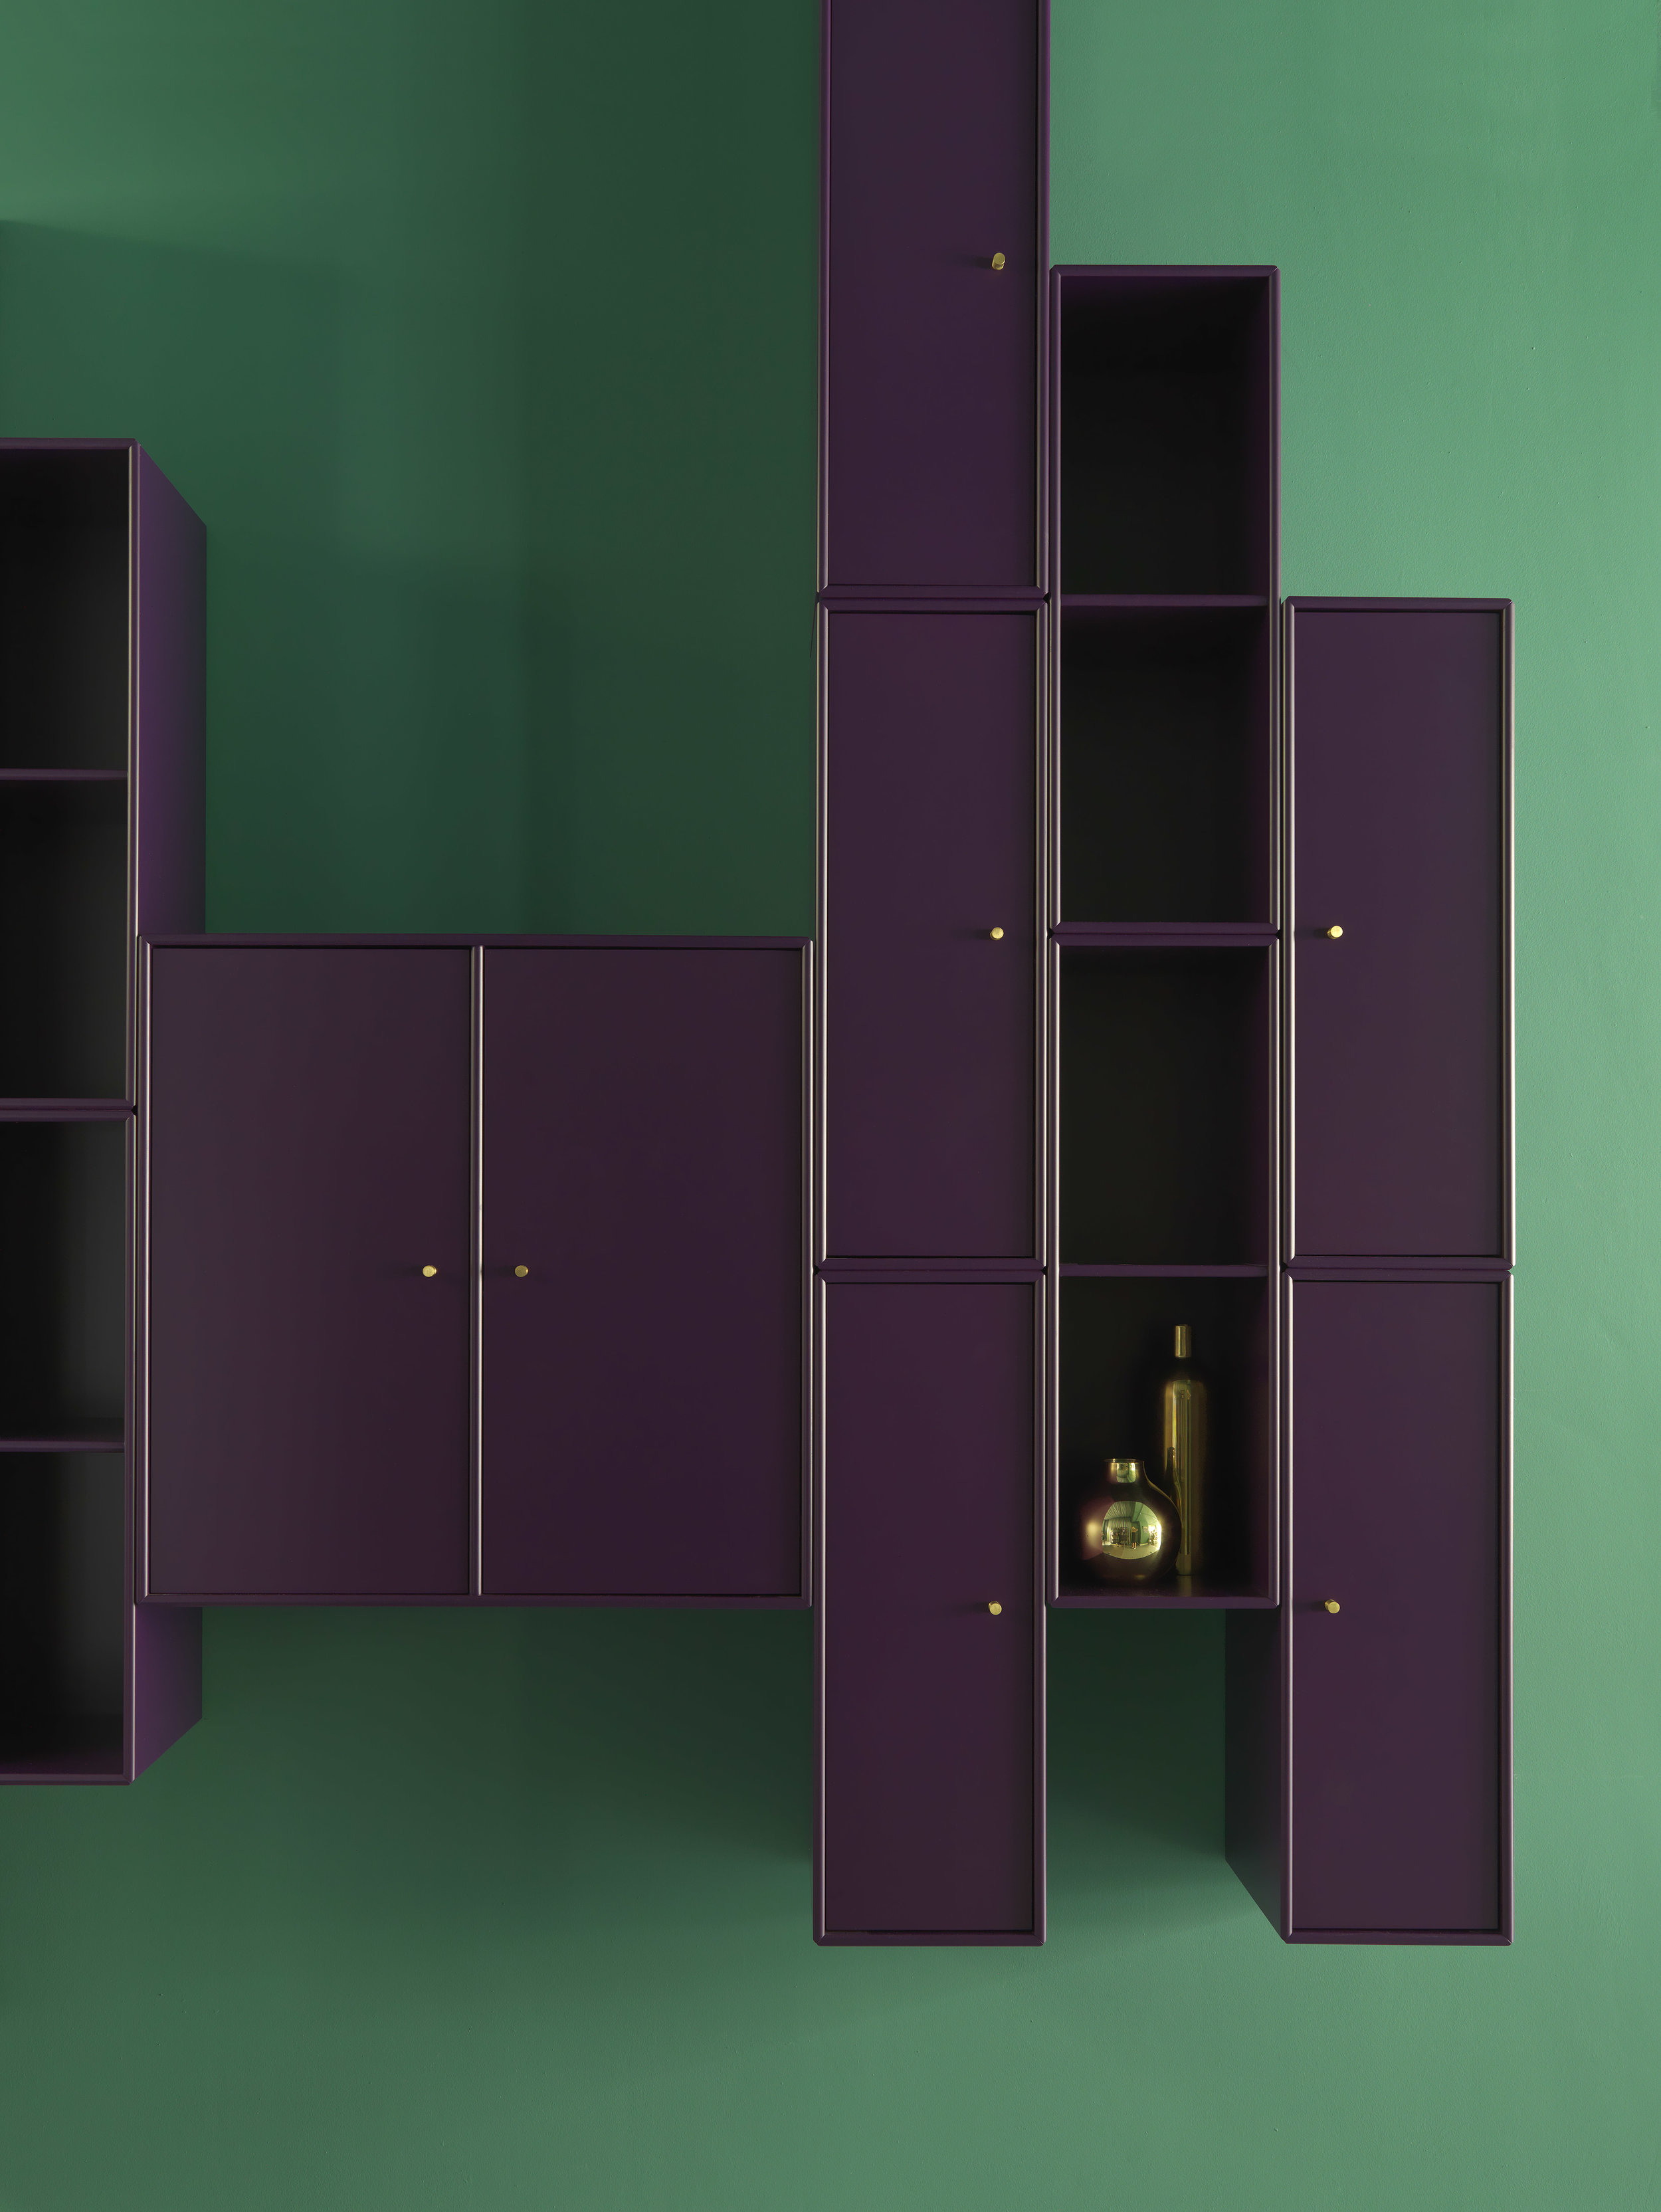 Montana designers Storage and shelving systems London Design Week home interior Scandinavian design Scandinavian home 4.jpg